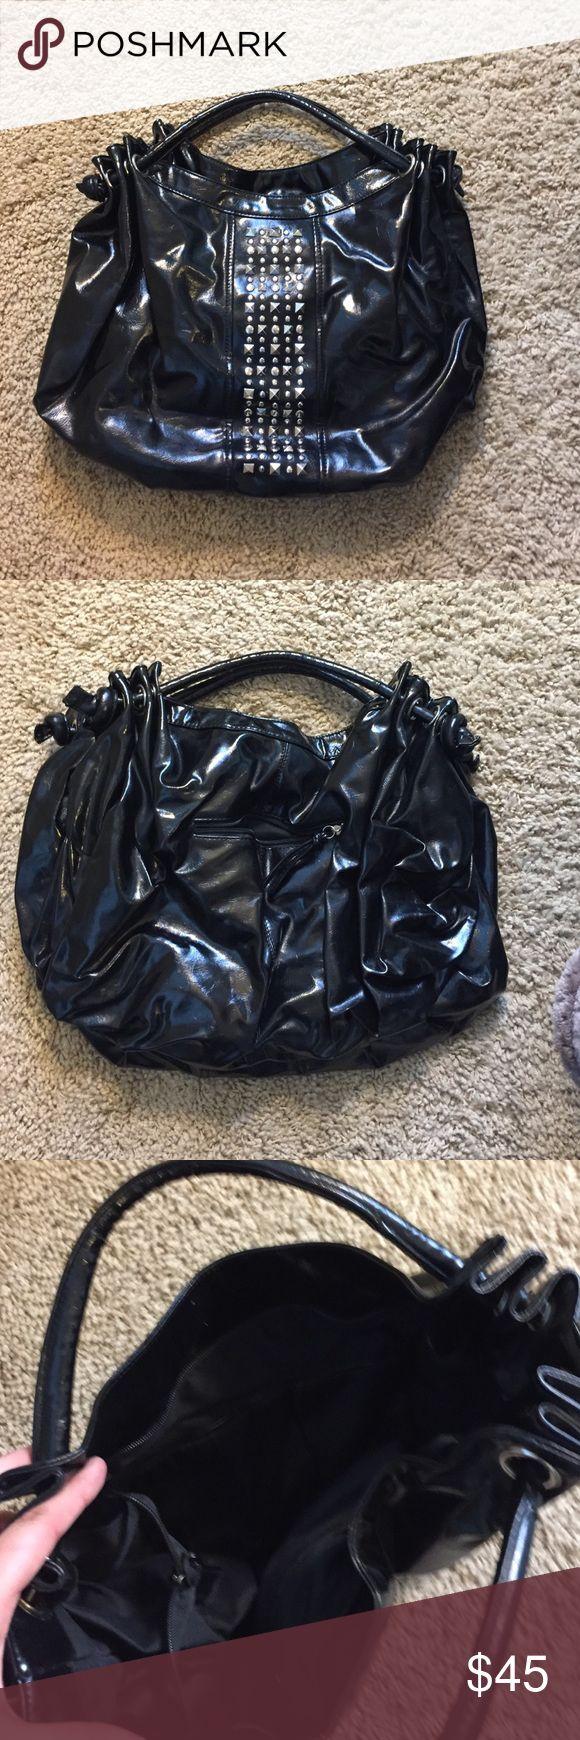 Black Patten Leather Studded Purse Black Patten Leather Studded Purse Bags Shoulder Bags